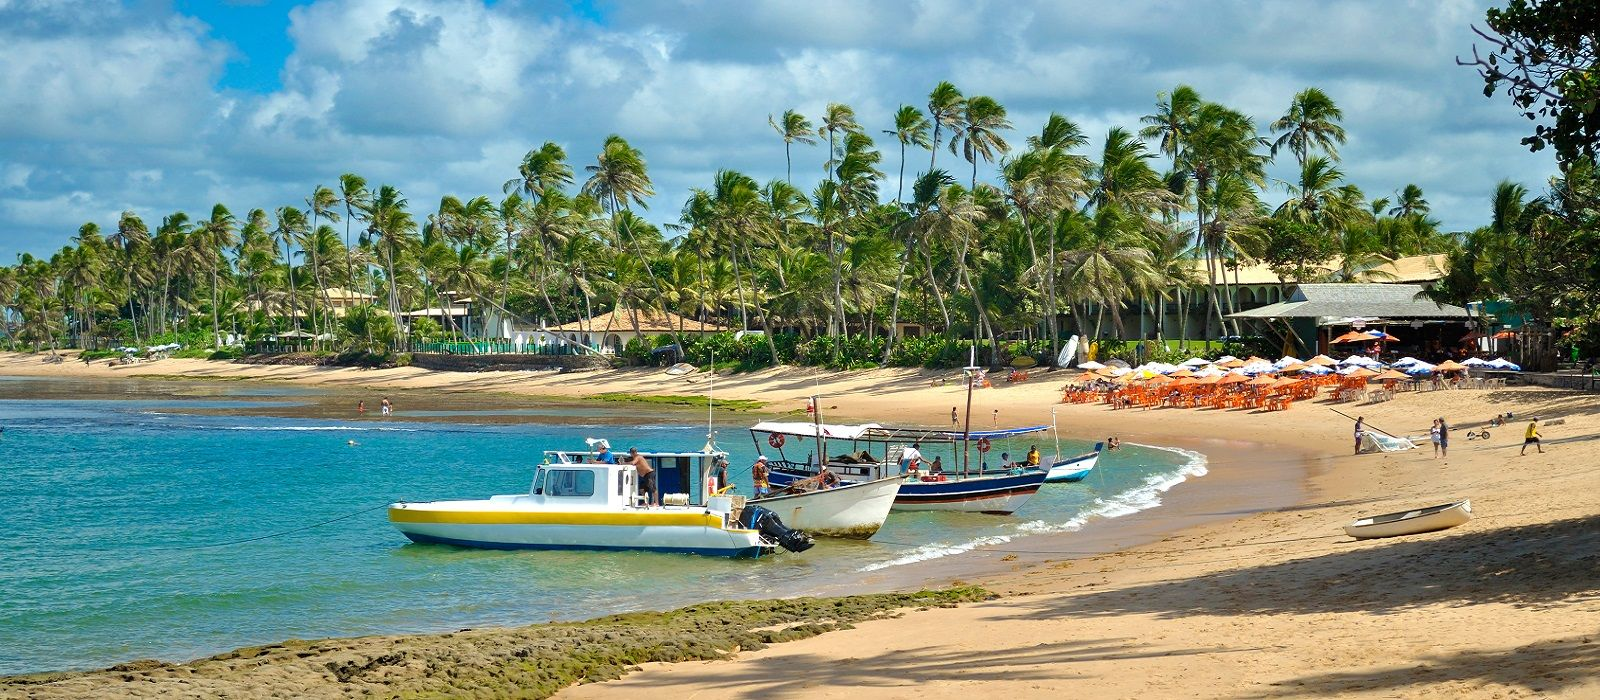 Destination Praia do Forte Brazil